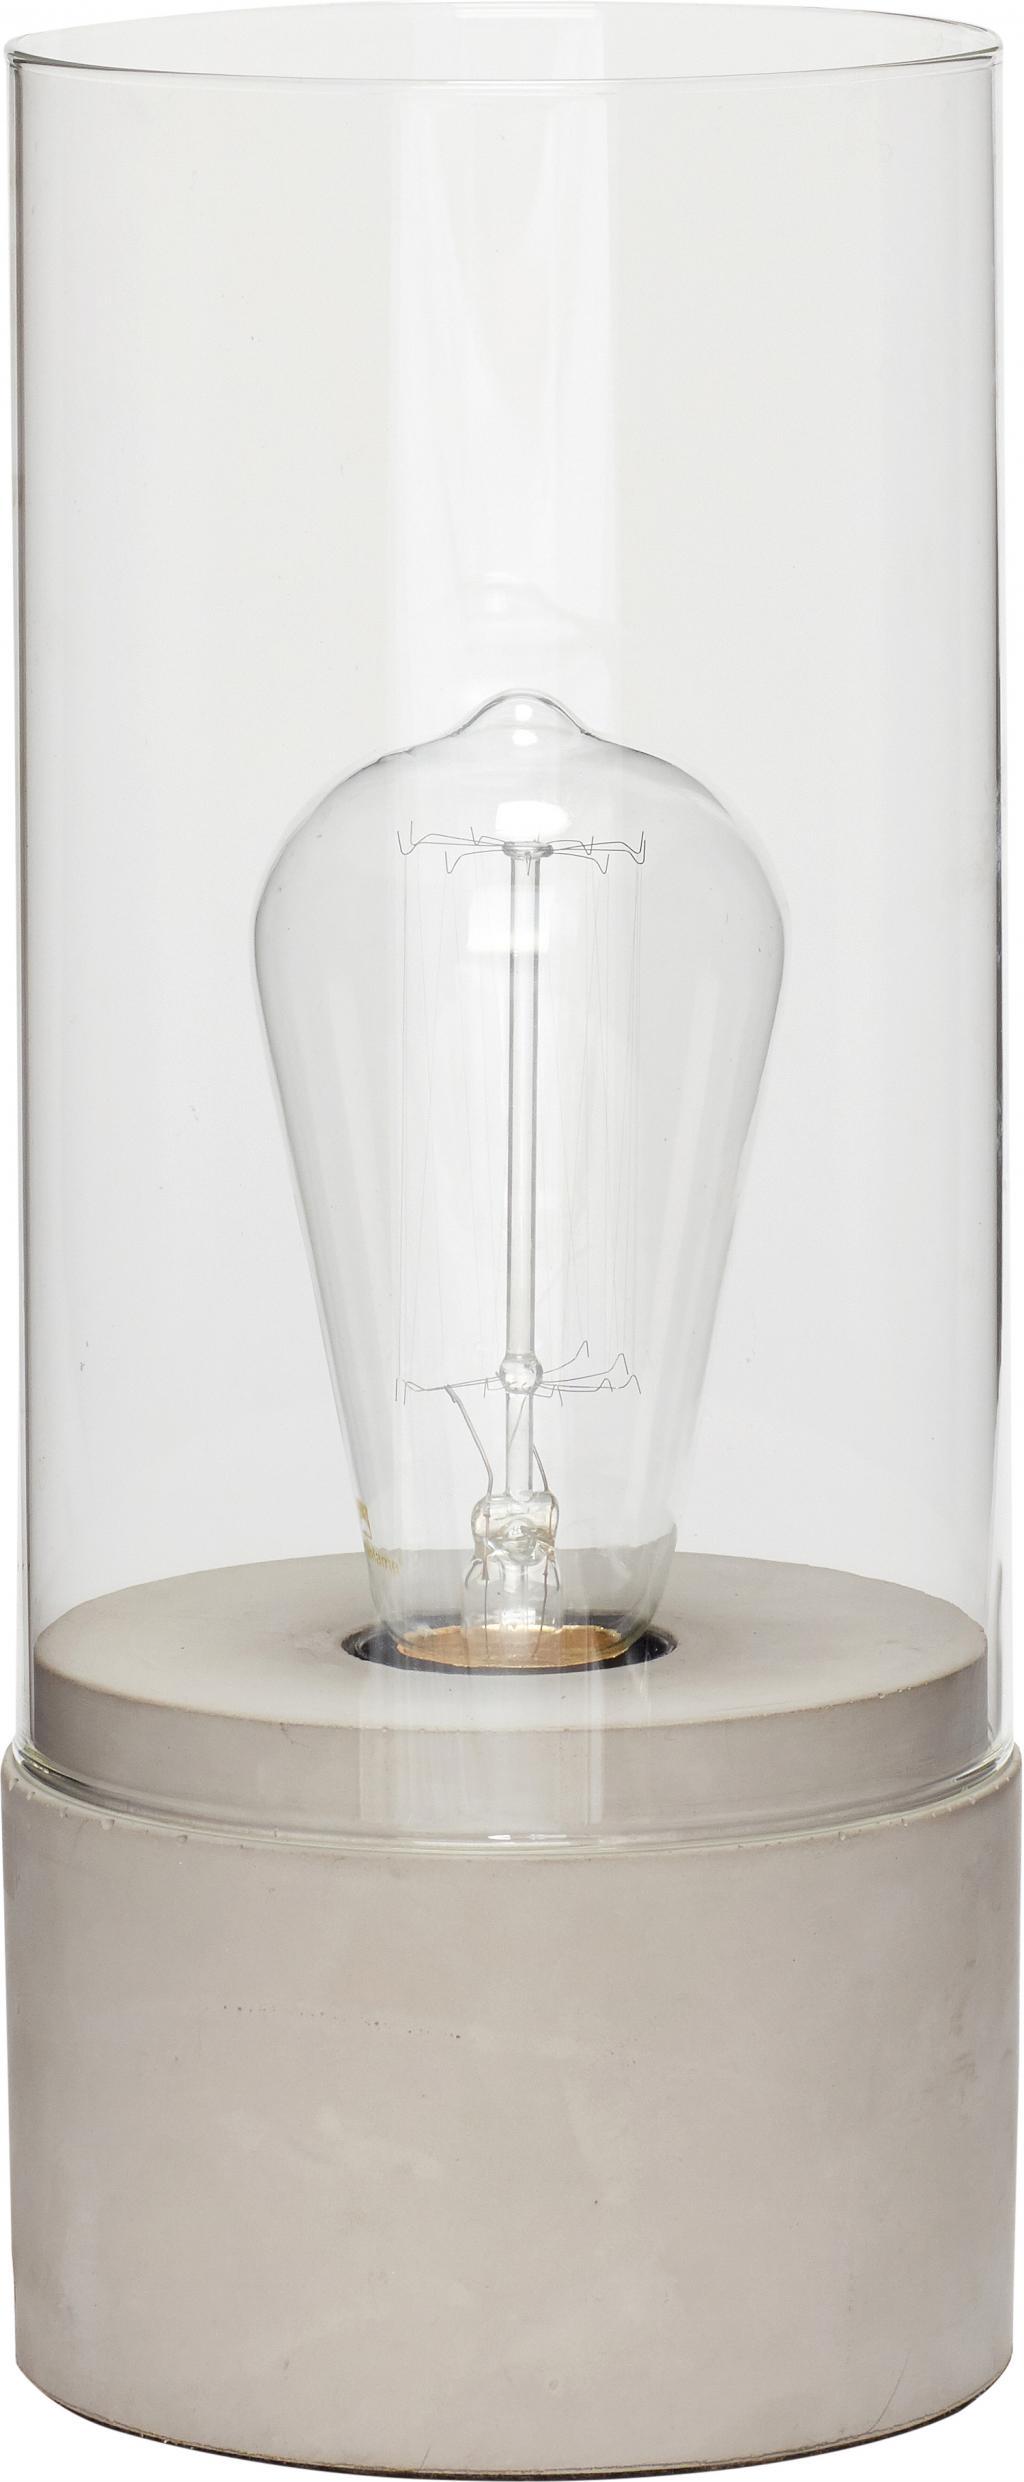 tafellamp---beton-glas---e27---40w---10x29-cm---hubsch[0].jpg